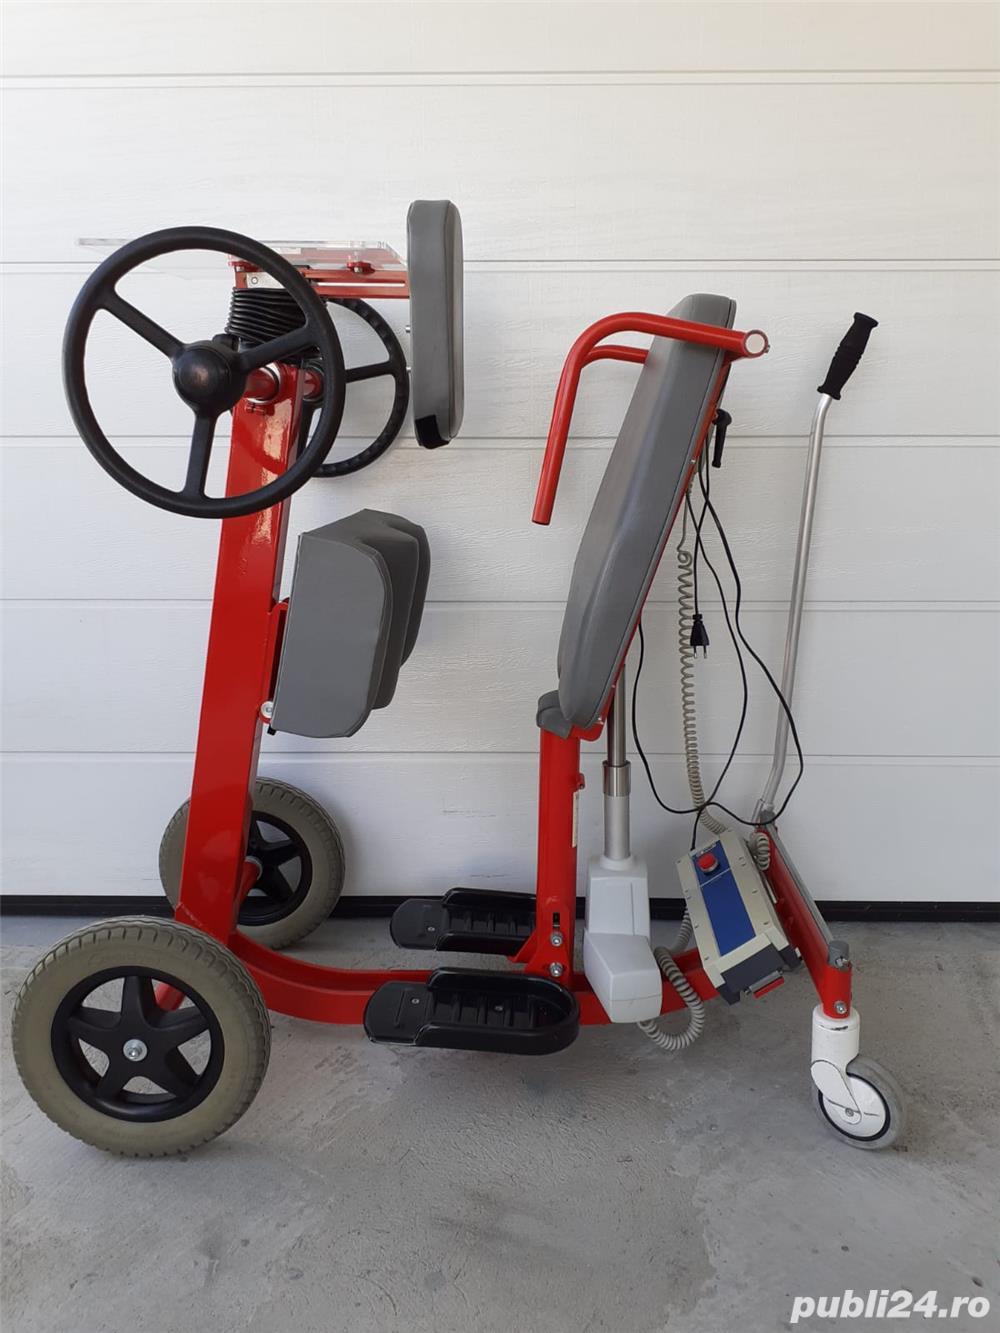 Verticalizator mobil Vitaline – 120 kg – (Standy mobil) – second-hand (folosit)